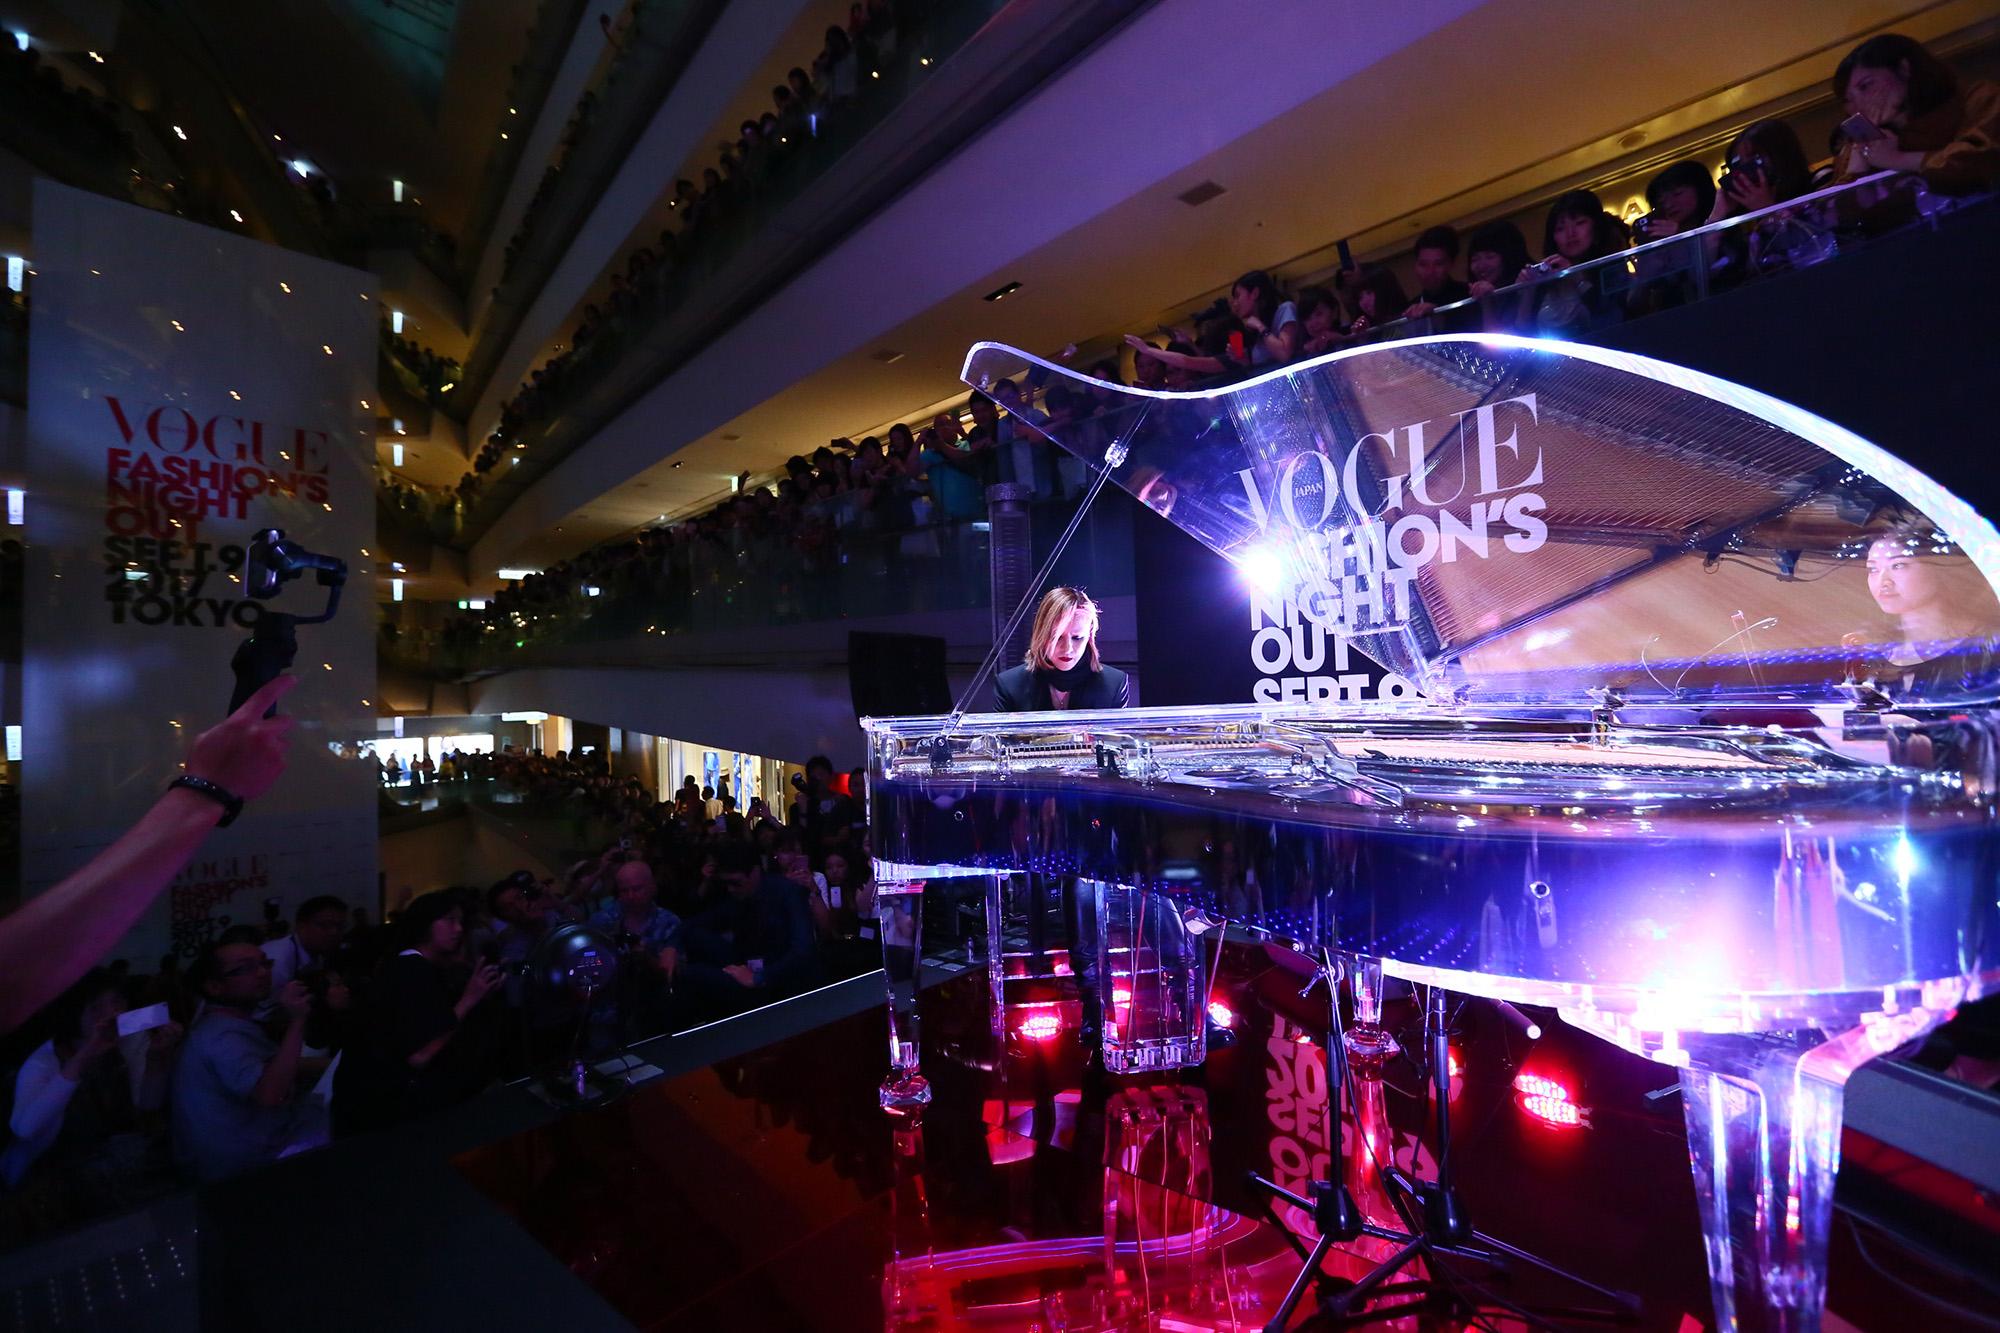 RMMS-Yoshiki-Vogue-Fashion-Night-Out-Japan-2017-0047